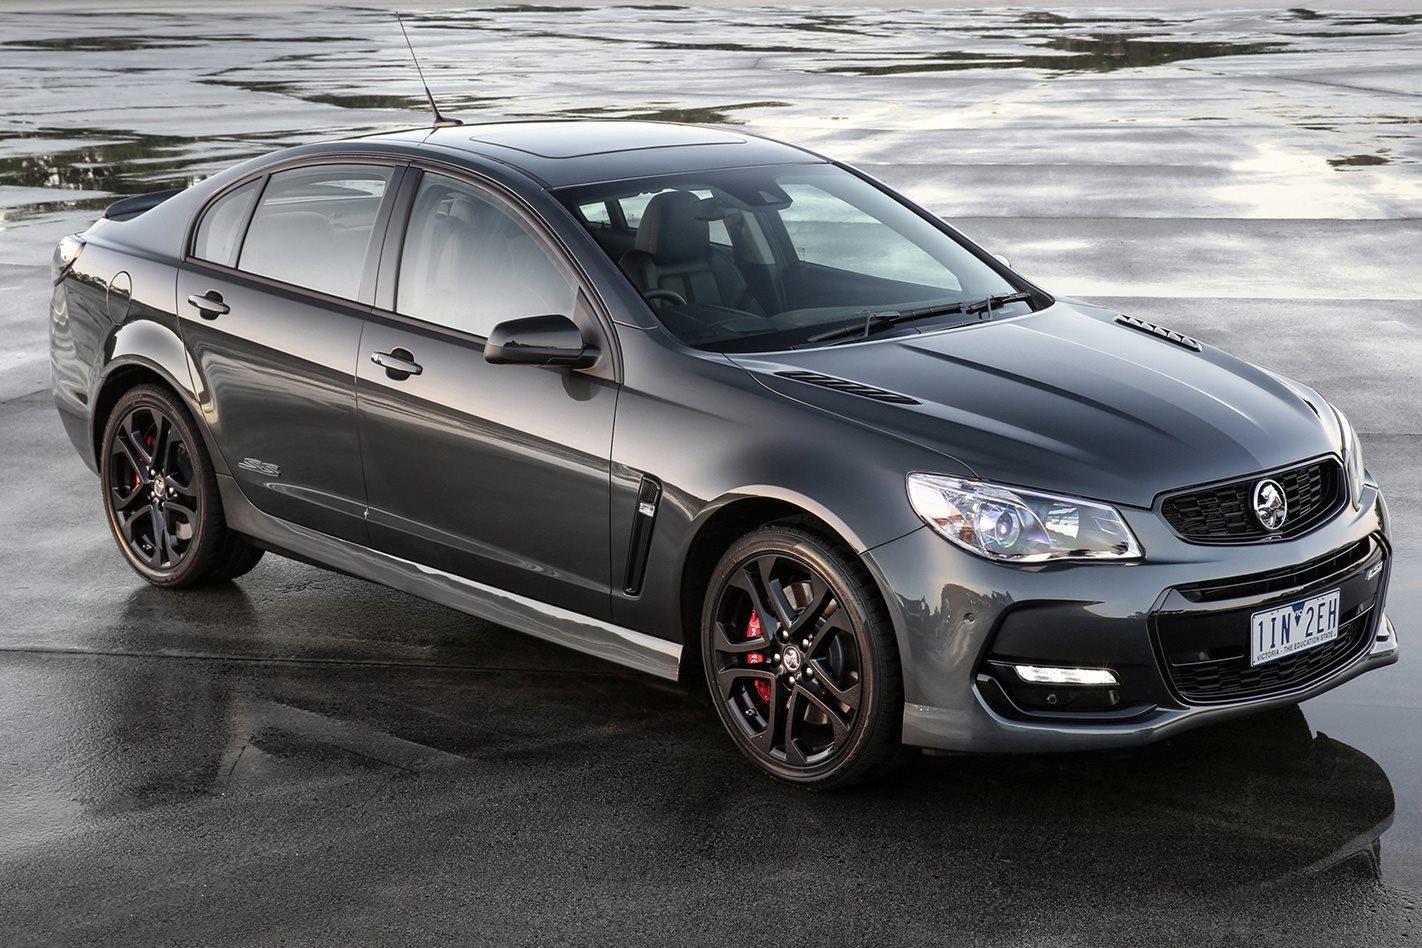 2017-Holden-Motorsport-Edition-Commodore.jpg